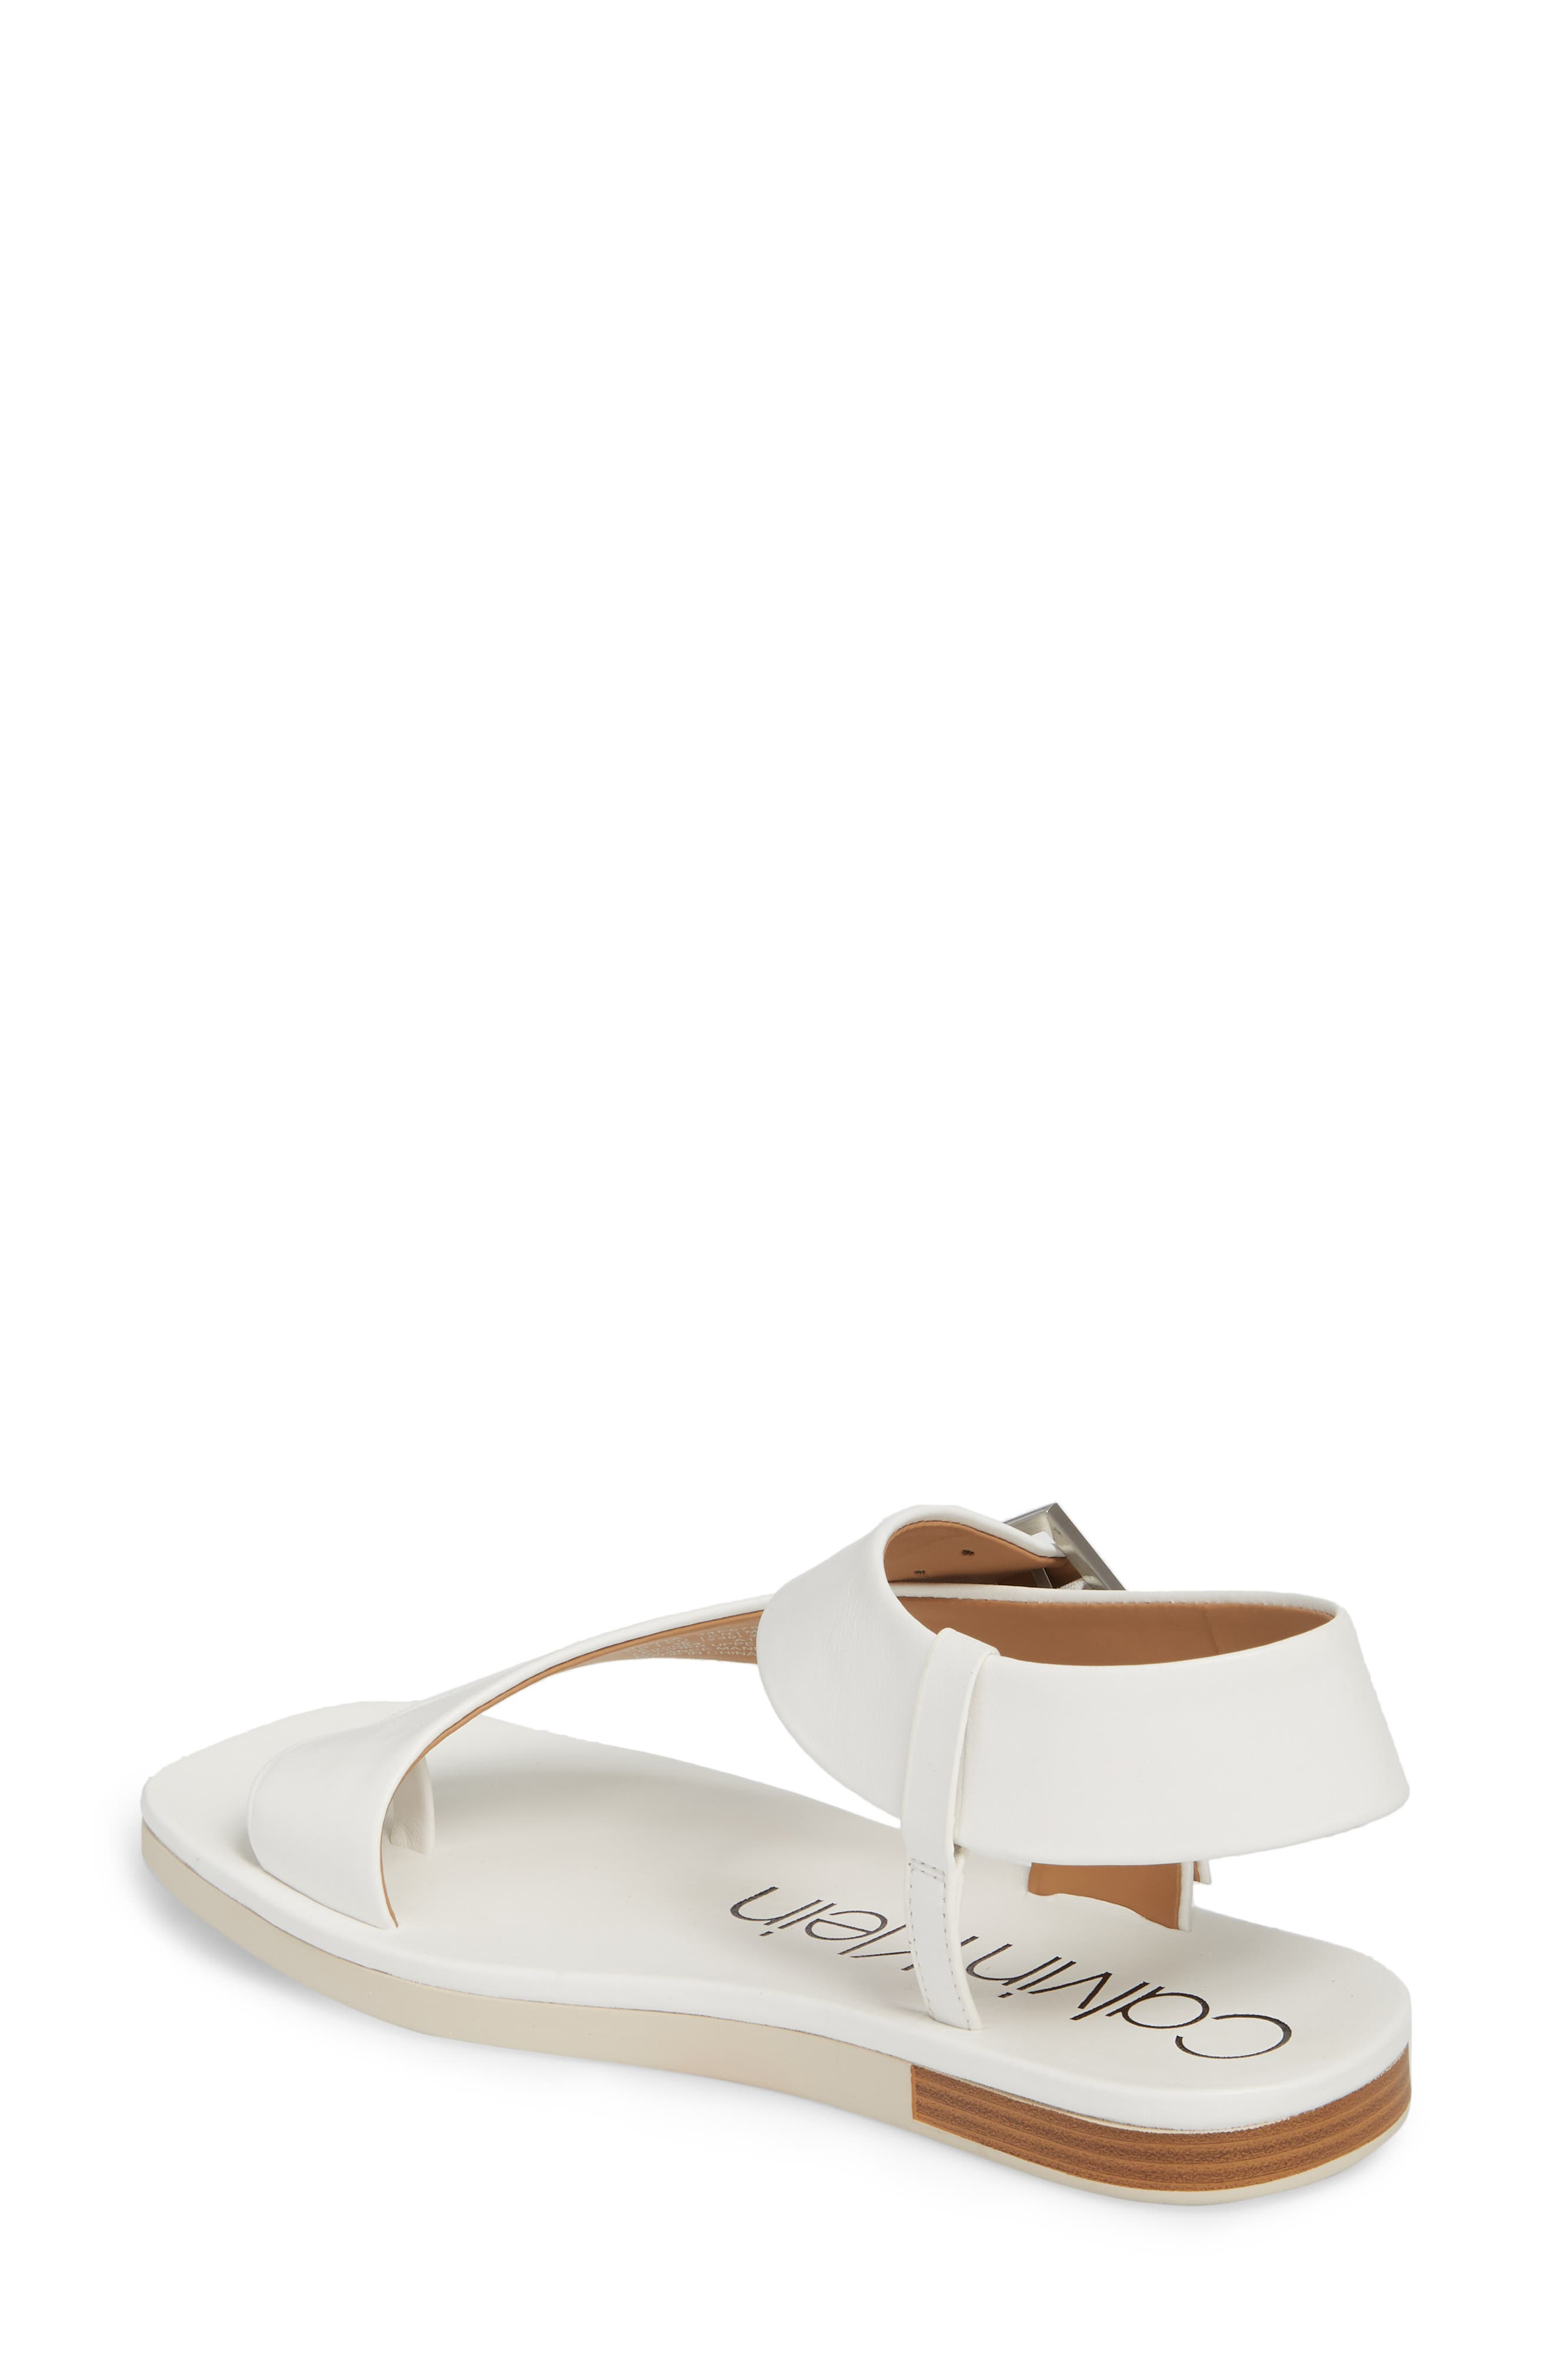 Rivita Sandal,                             Alternate thumbnail 2, color,                             Platinum White Leather